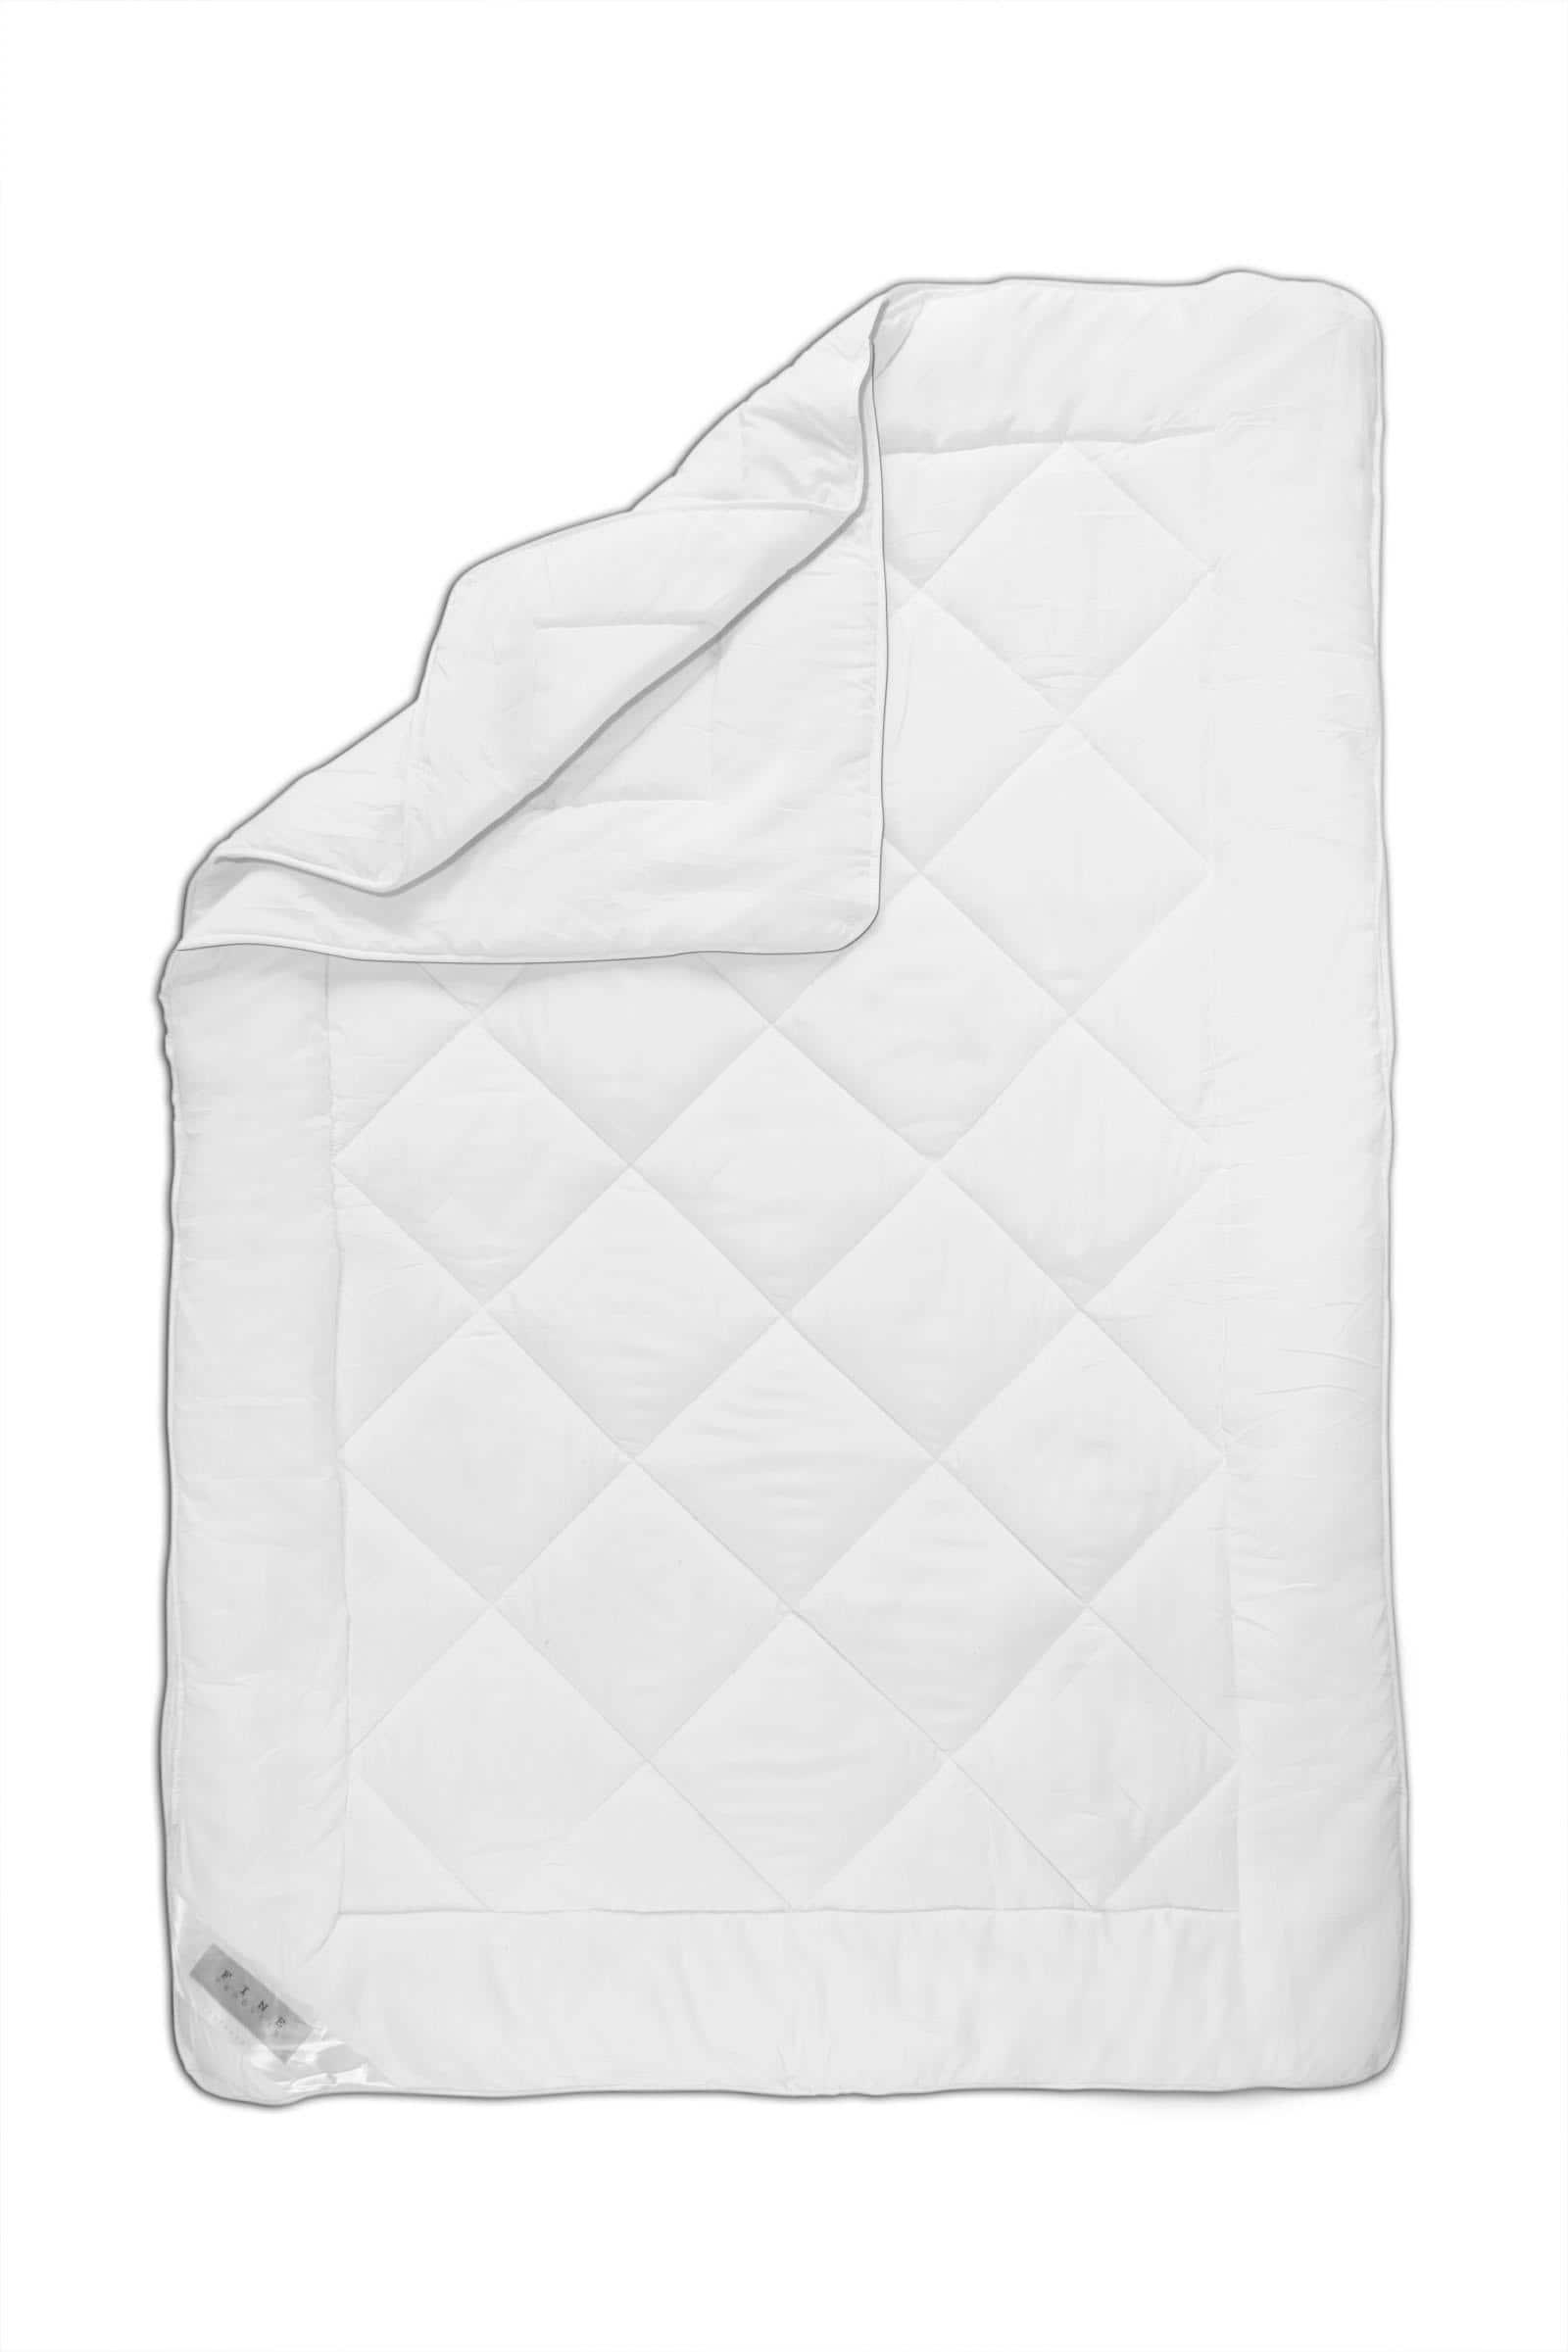 Hanse® 4-Seizoenen Dekbed - éénpersoons - 135x200 cm - 500gr/700gr